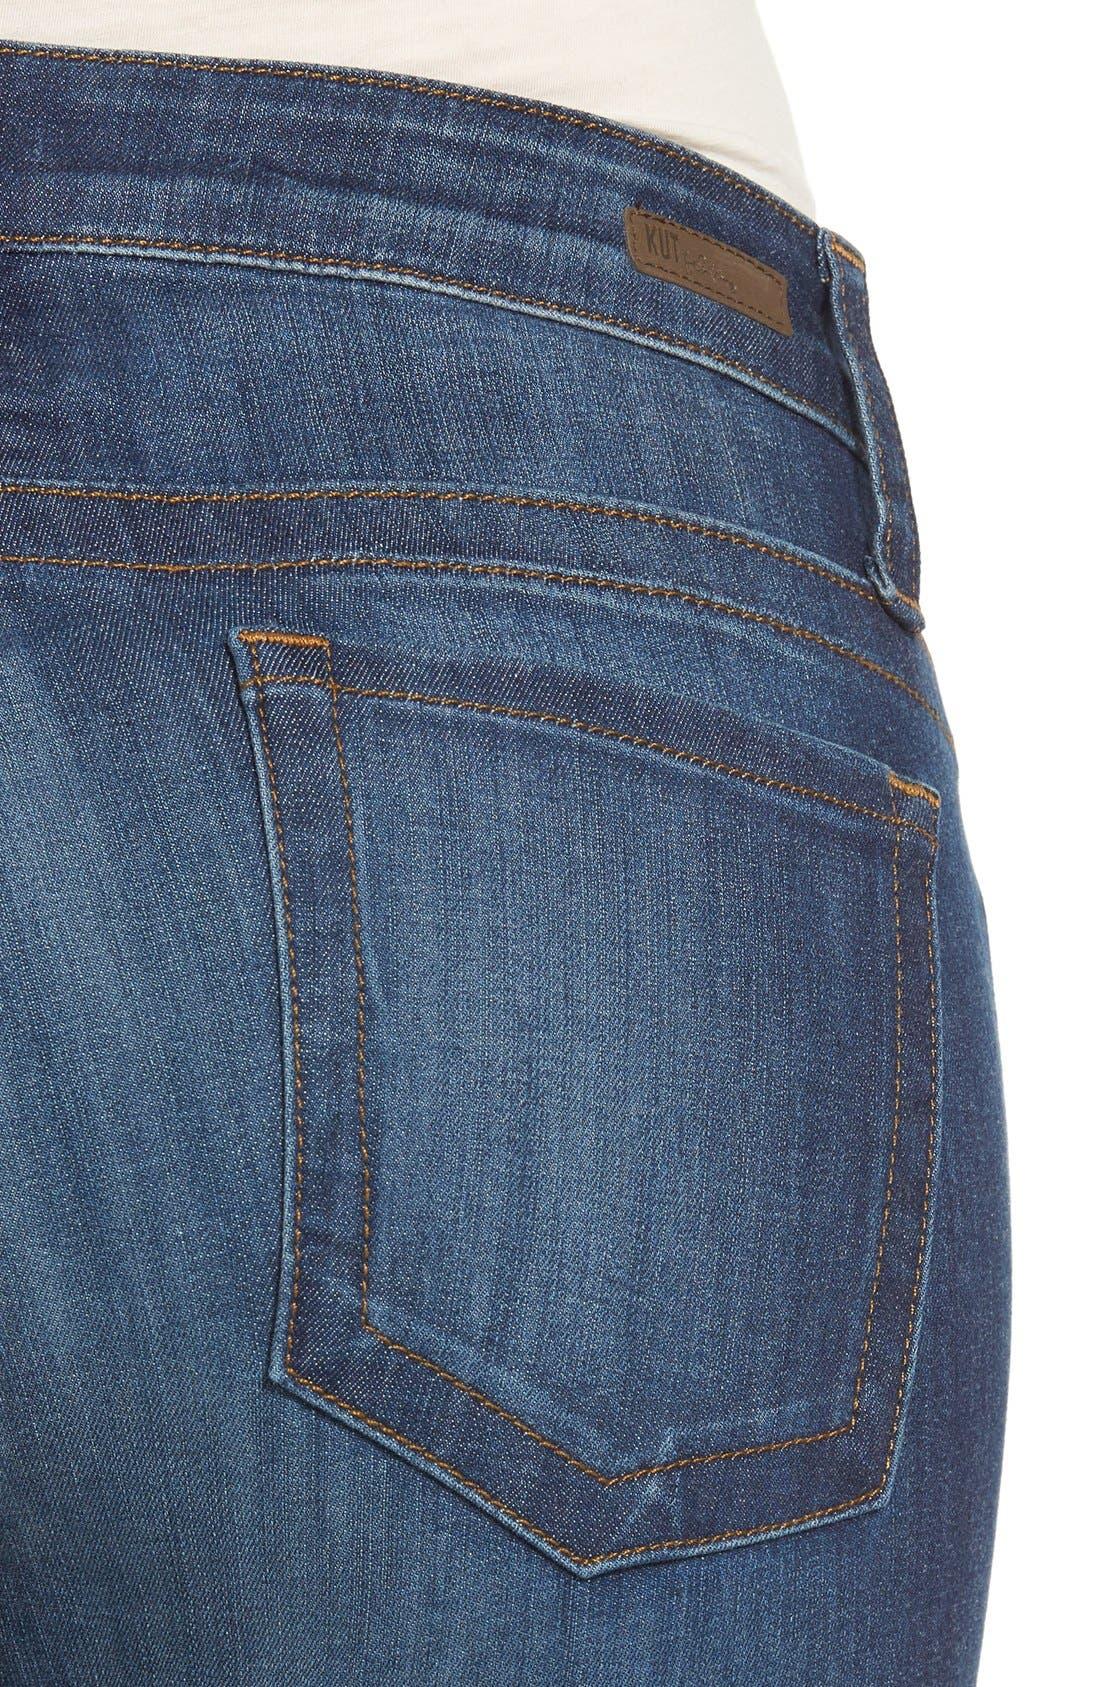 'Stevie' Stretch Straight Leg Jeans,                             Alternate thumbnail 5, color,                             400